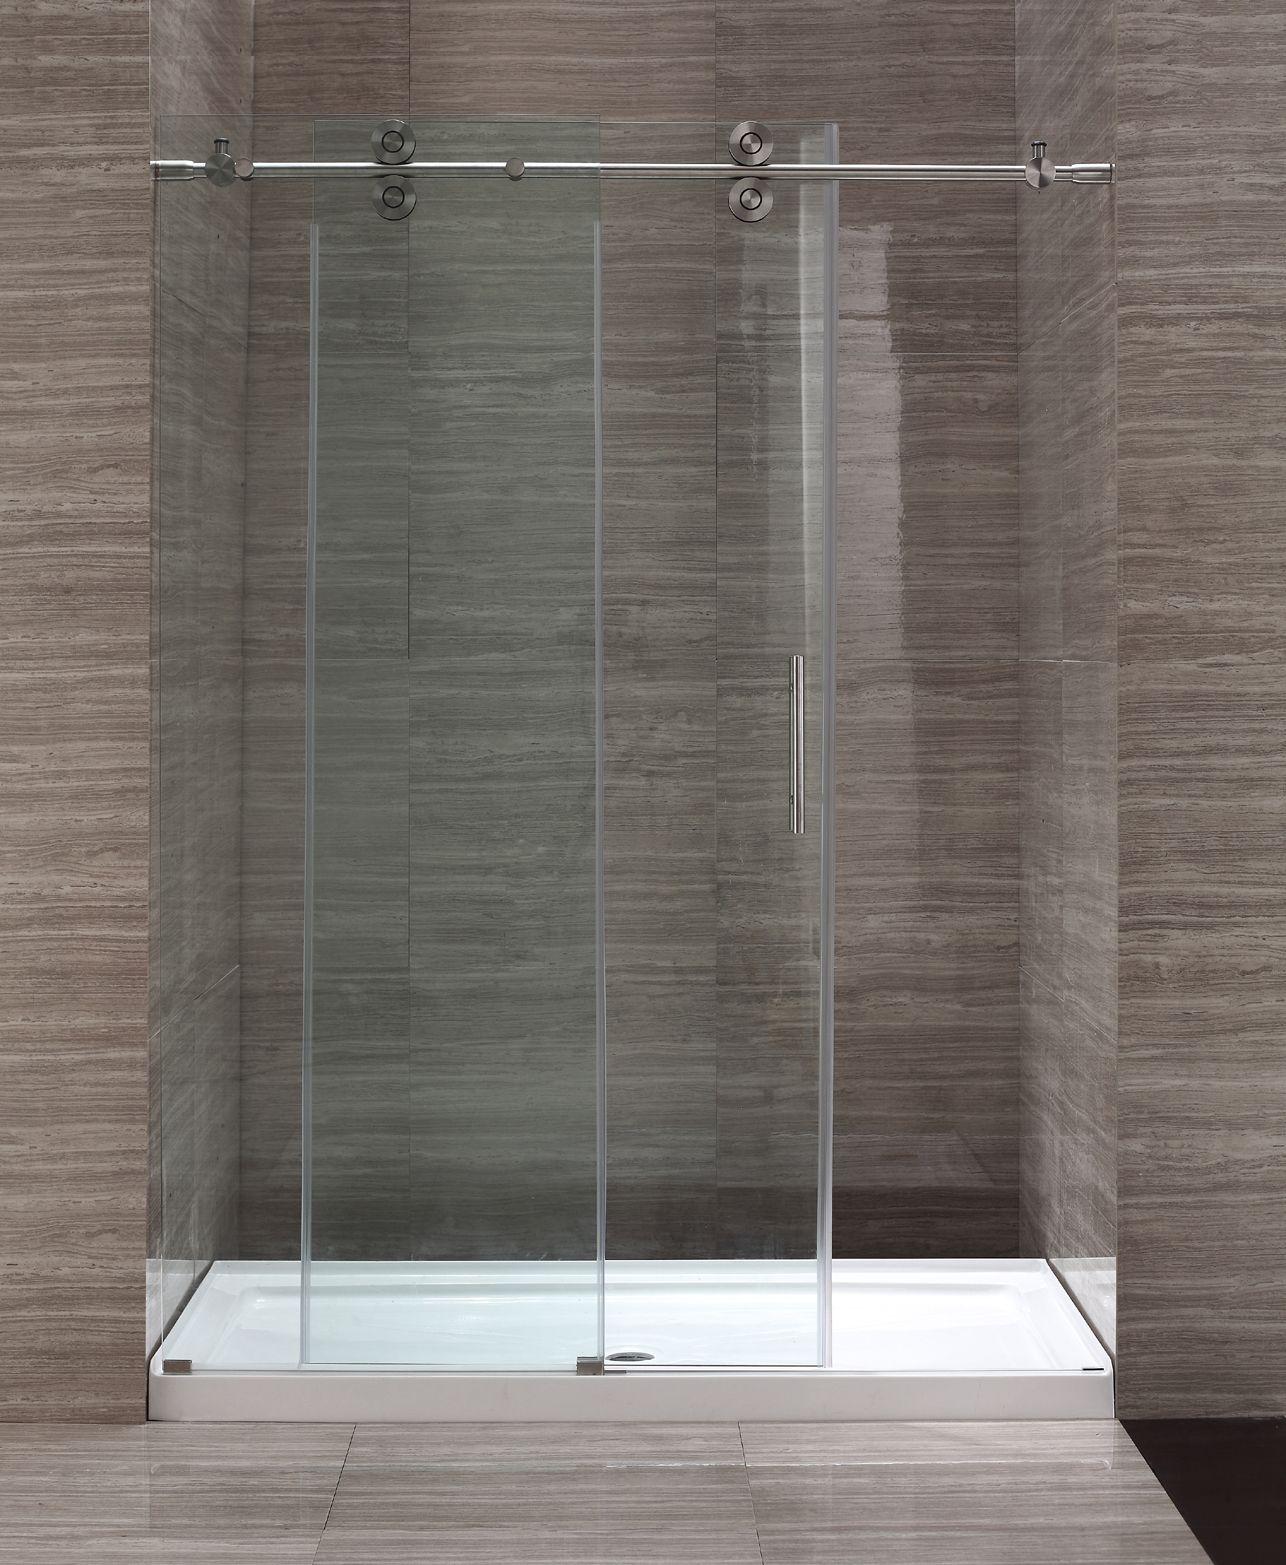 Ove Decors 60 Glass Sliding Door Shower Enclosure OWS 107 GP